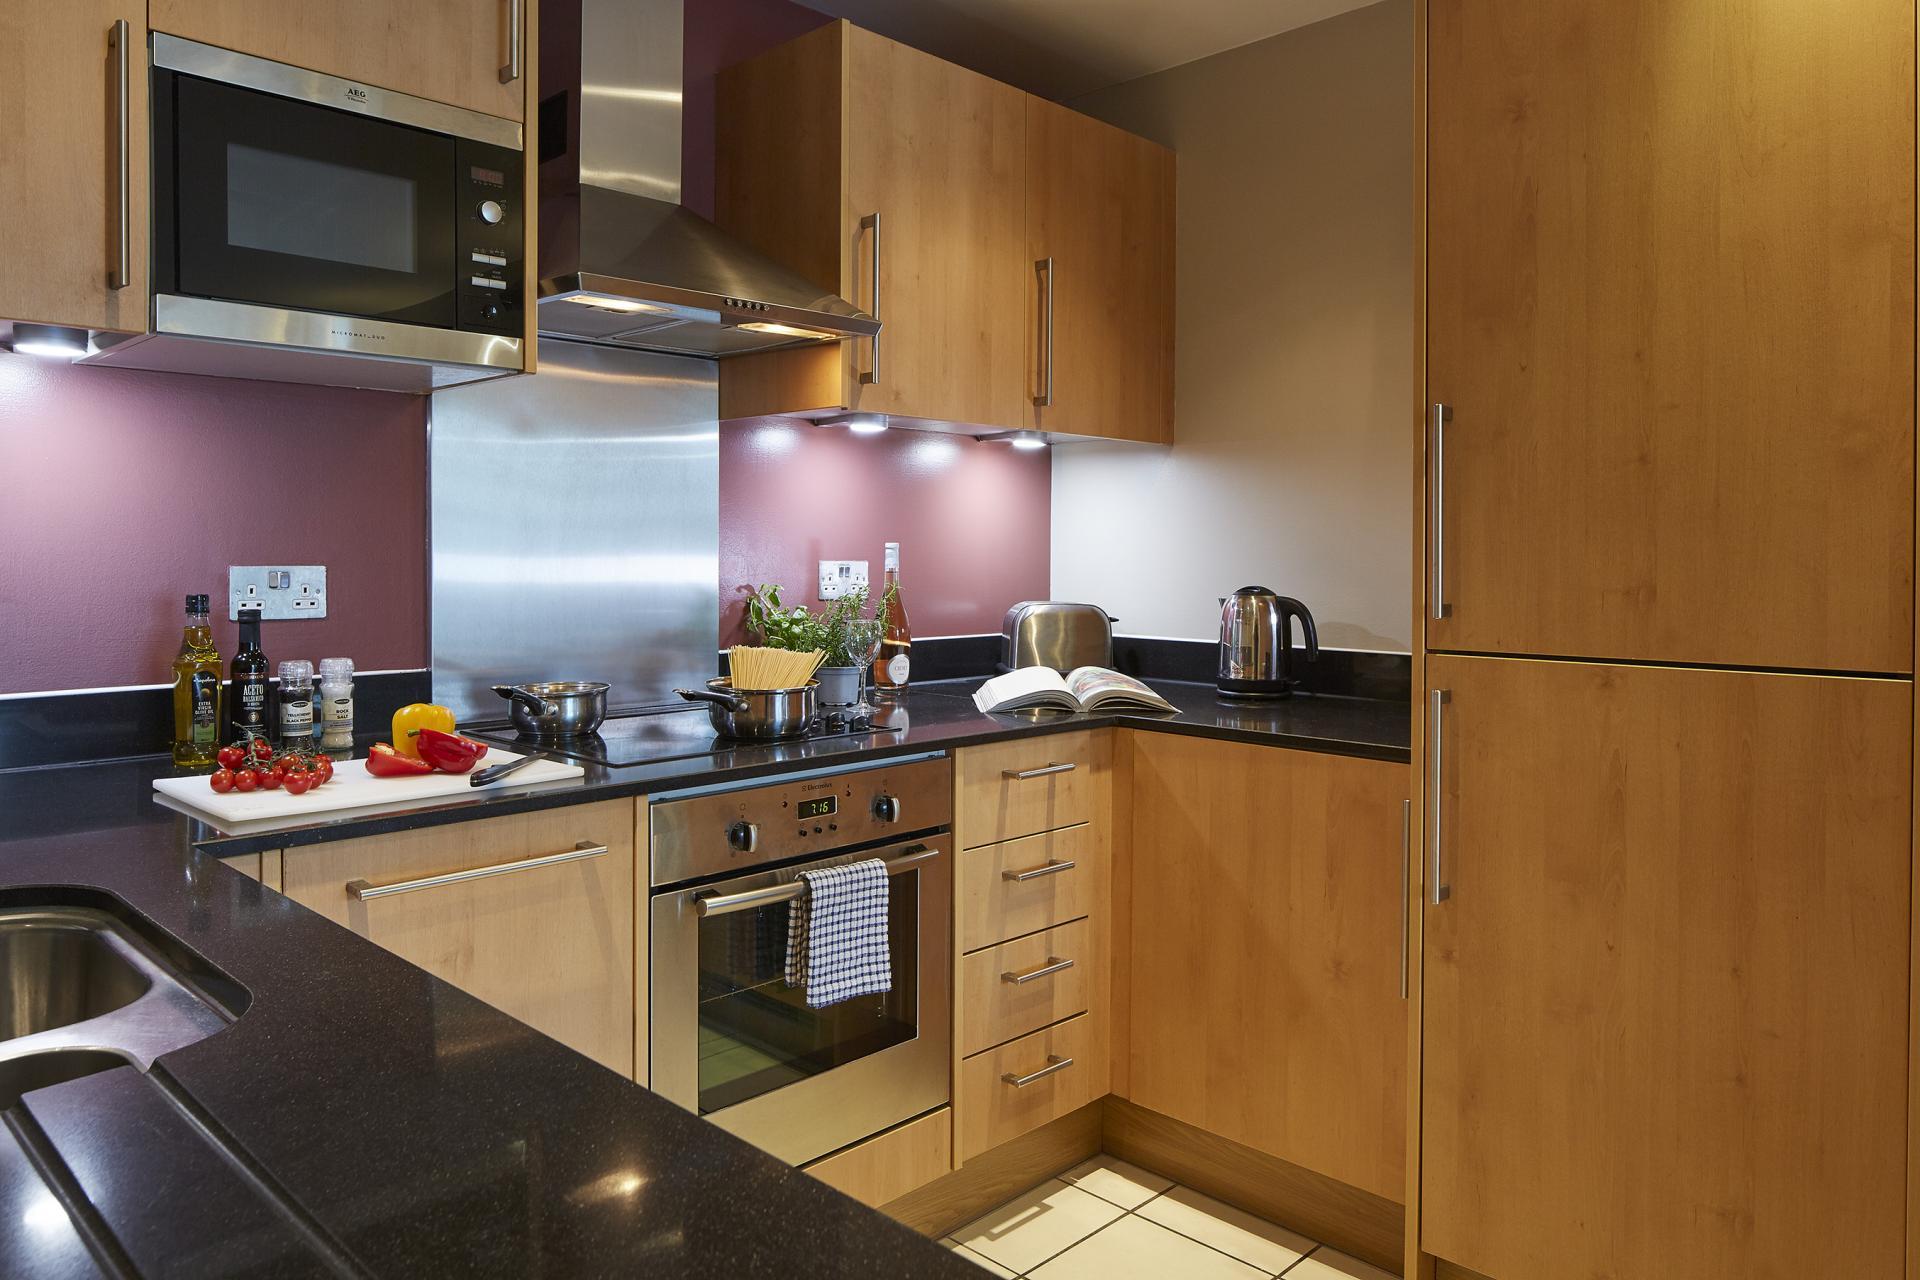 Kitchen at Empire Square Apartments, London Bridge, London